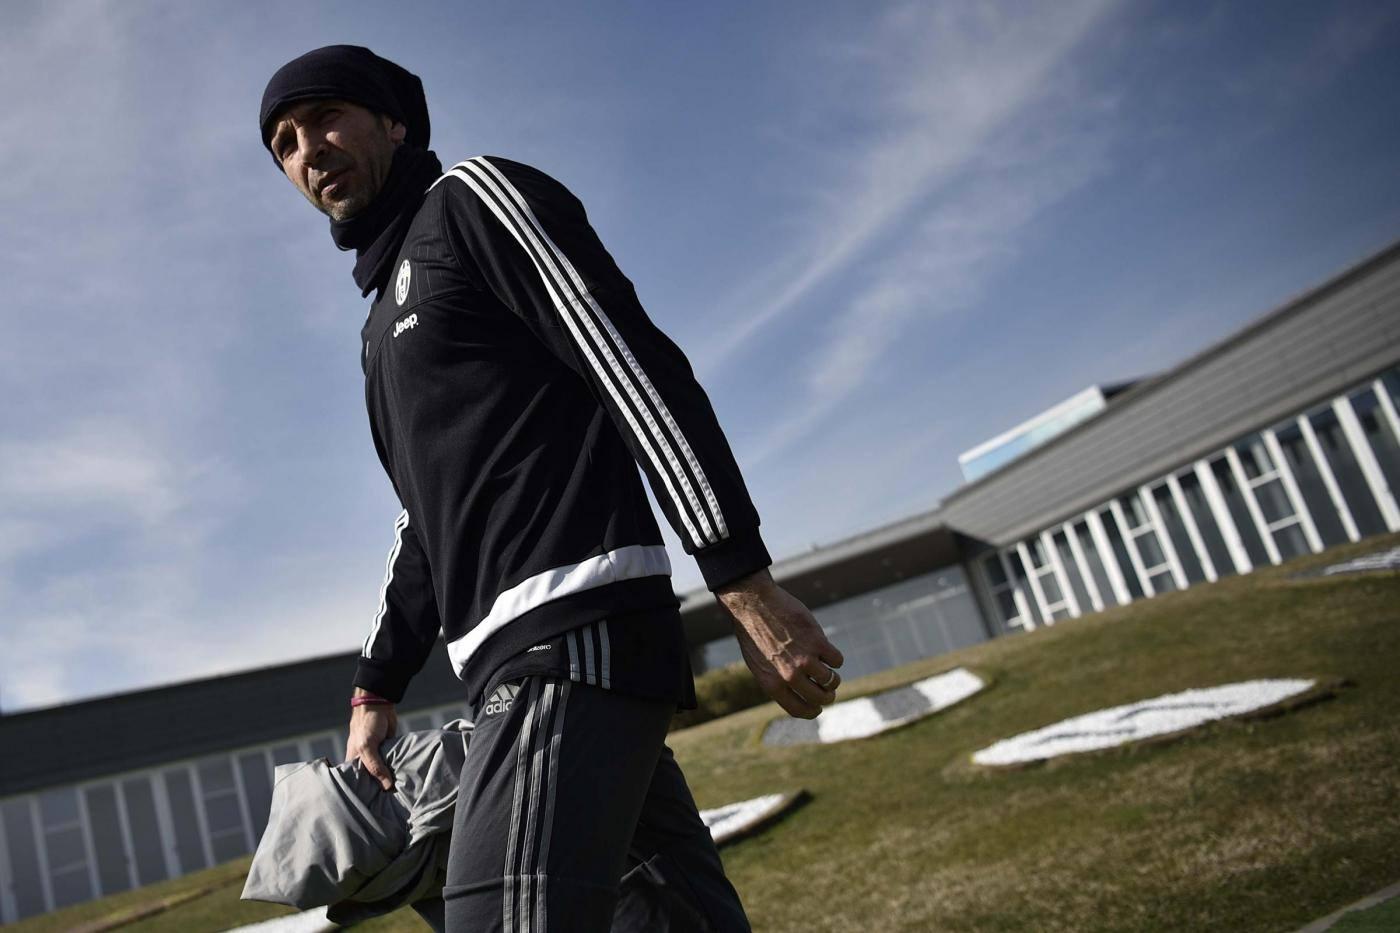 Allenamento della Juventus a Vinovo